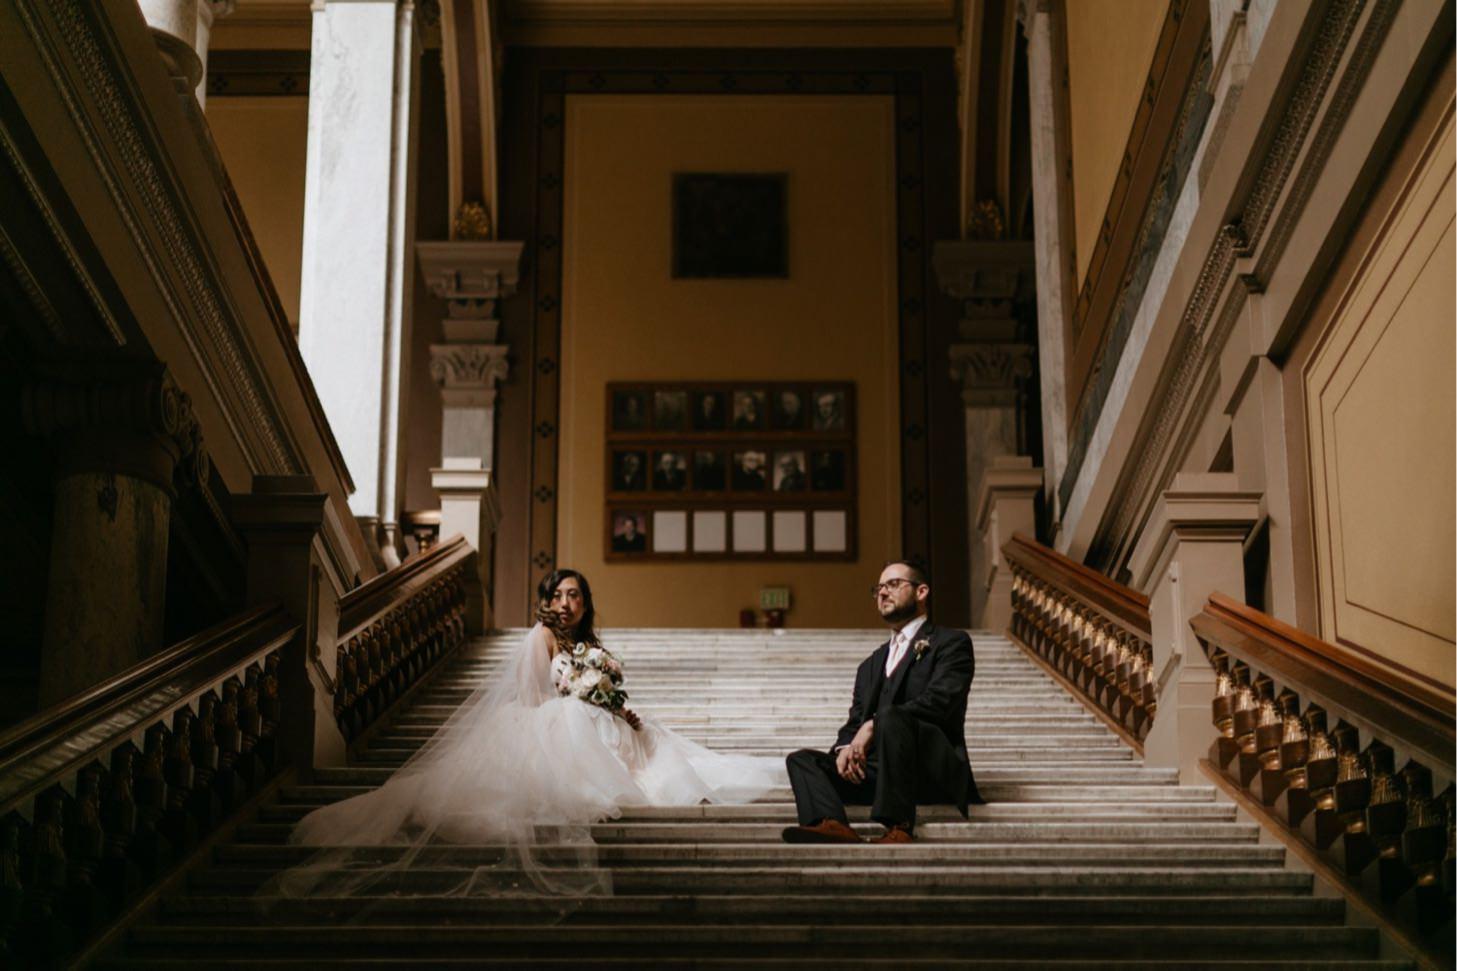 indiana-state-house-wedding-downtown-indianapolis-wedding-photographer075.JPG